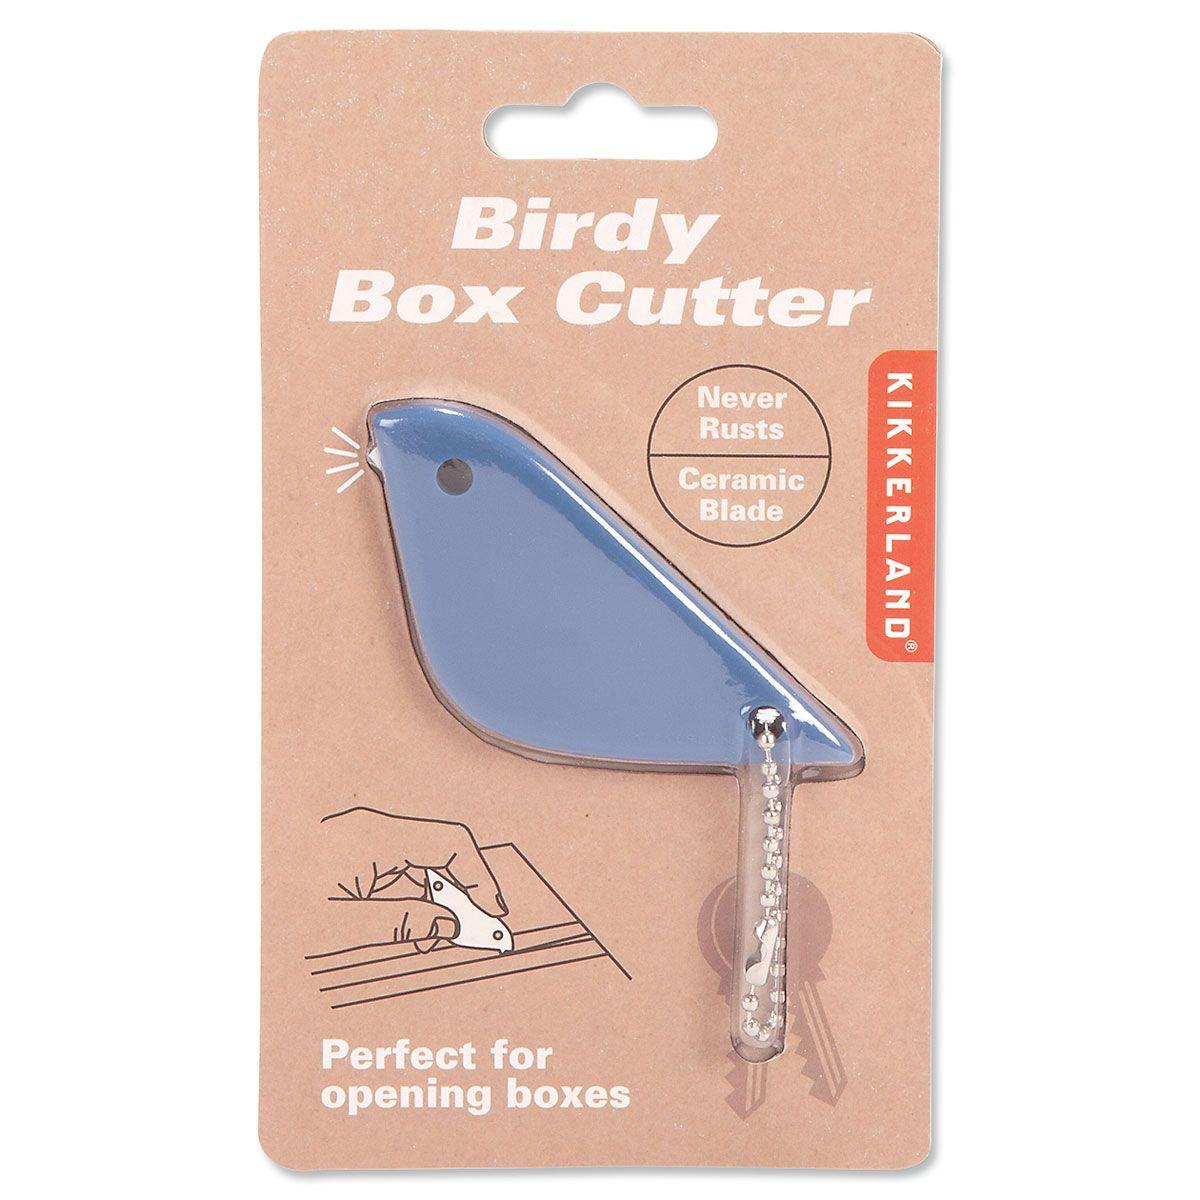 Birdy Box Cutter